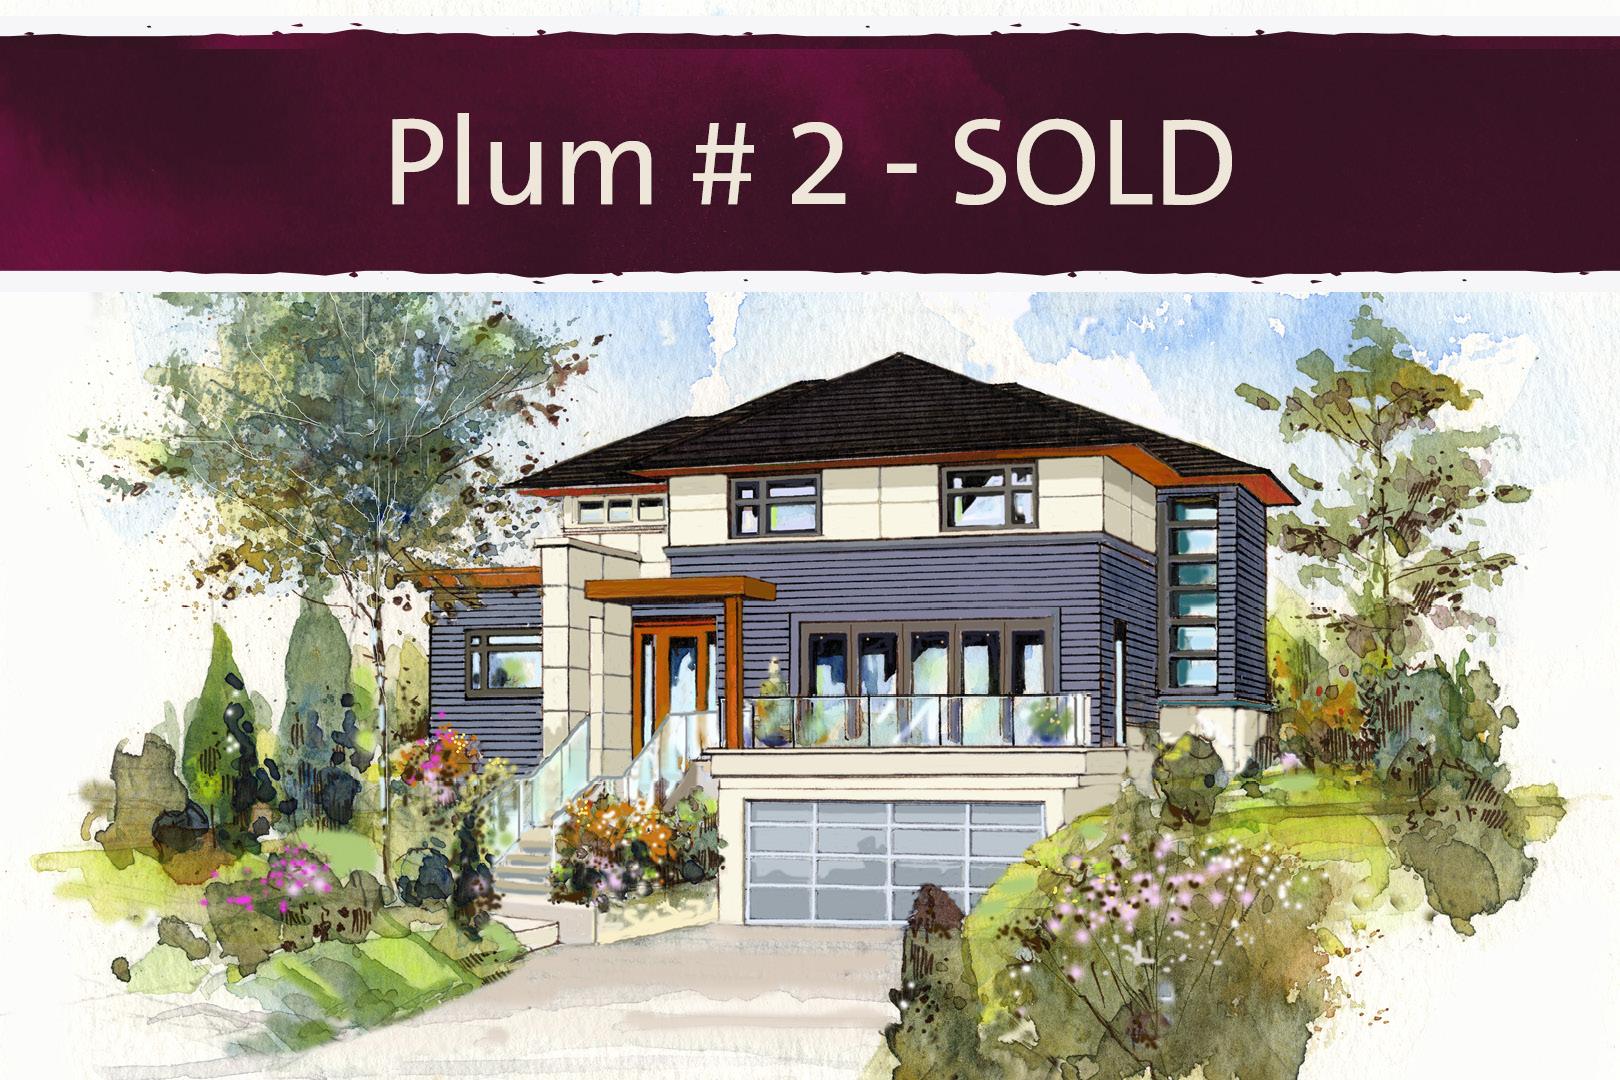 10 Plums Sold Homes version 23.jpg